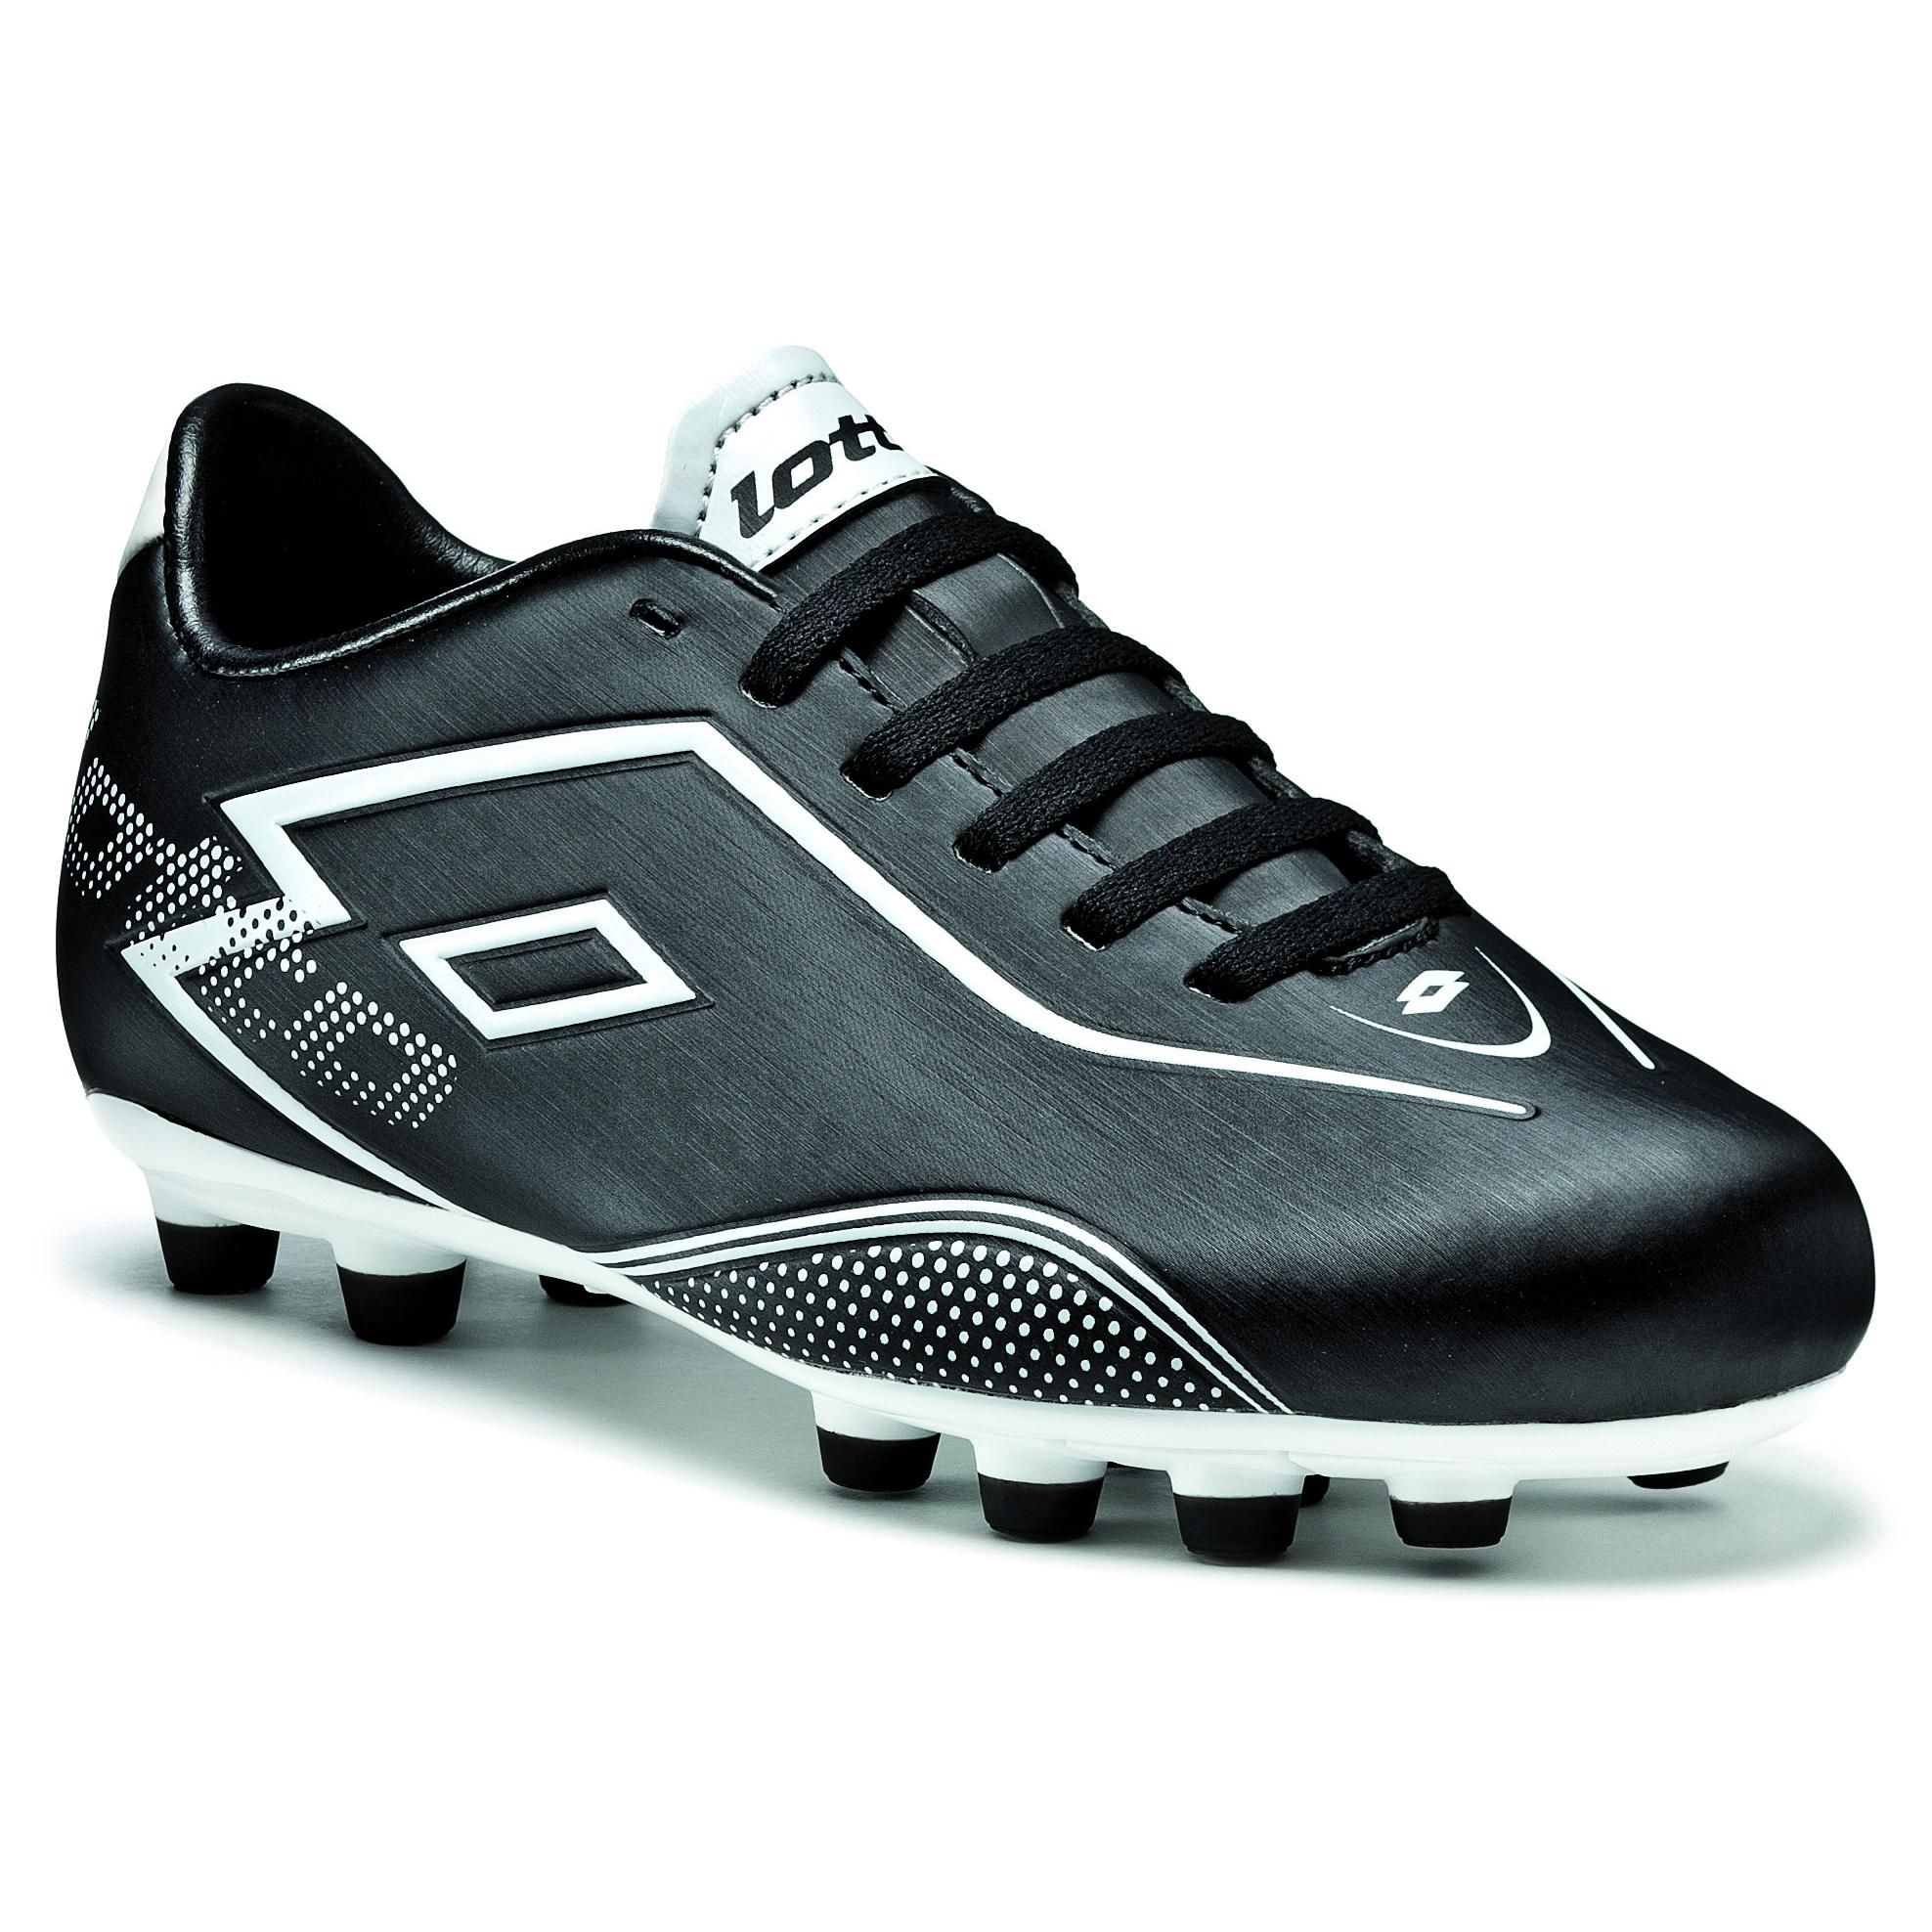 Lotto Zhero Gravity.II 700 Firm Ground Football Boots - Black/White - Kids